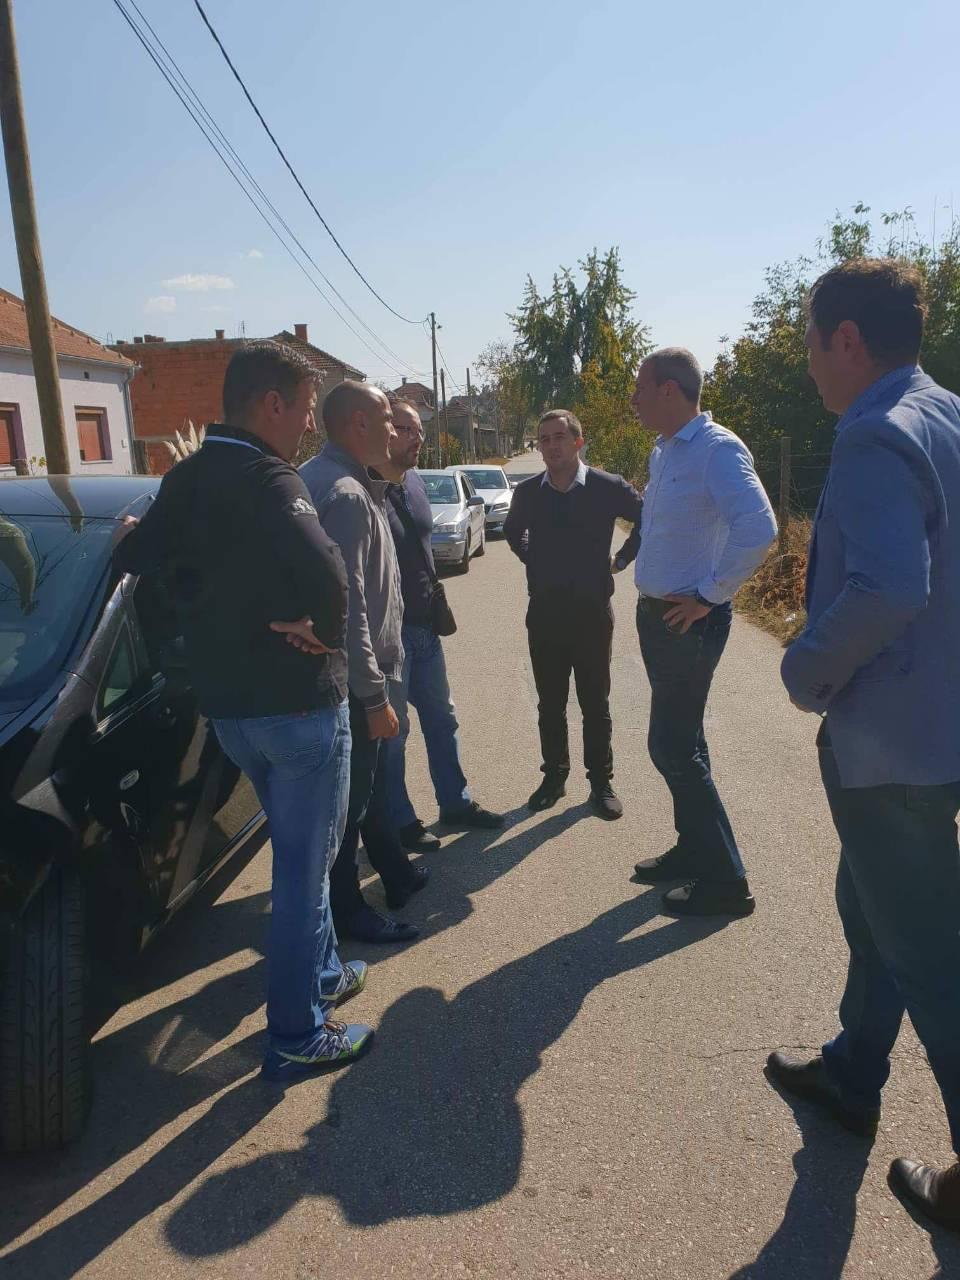 Predsednik obišao naselje Boševo